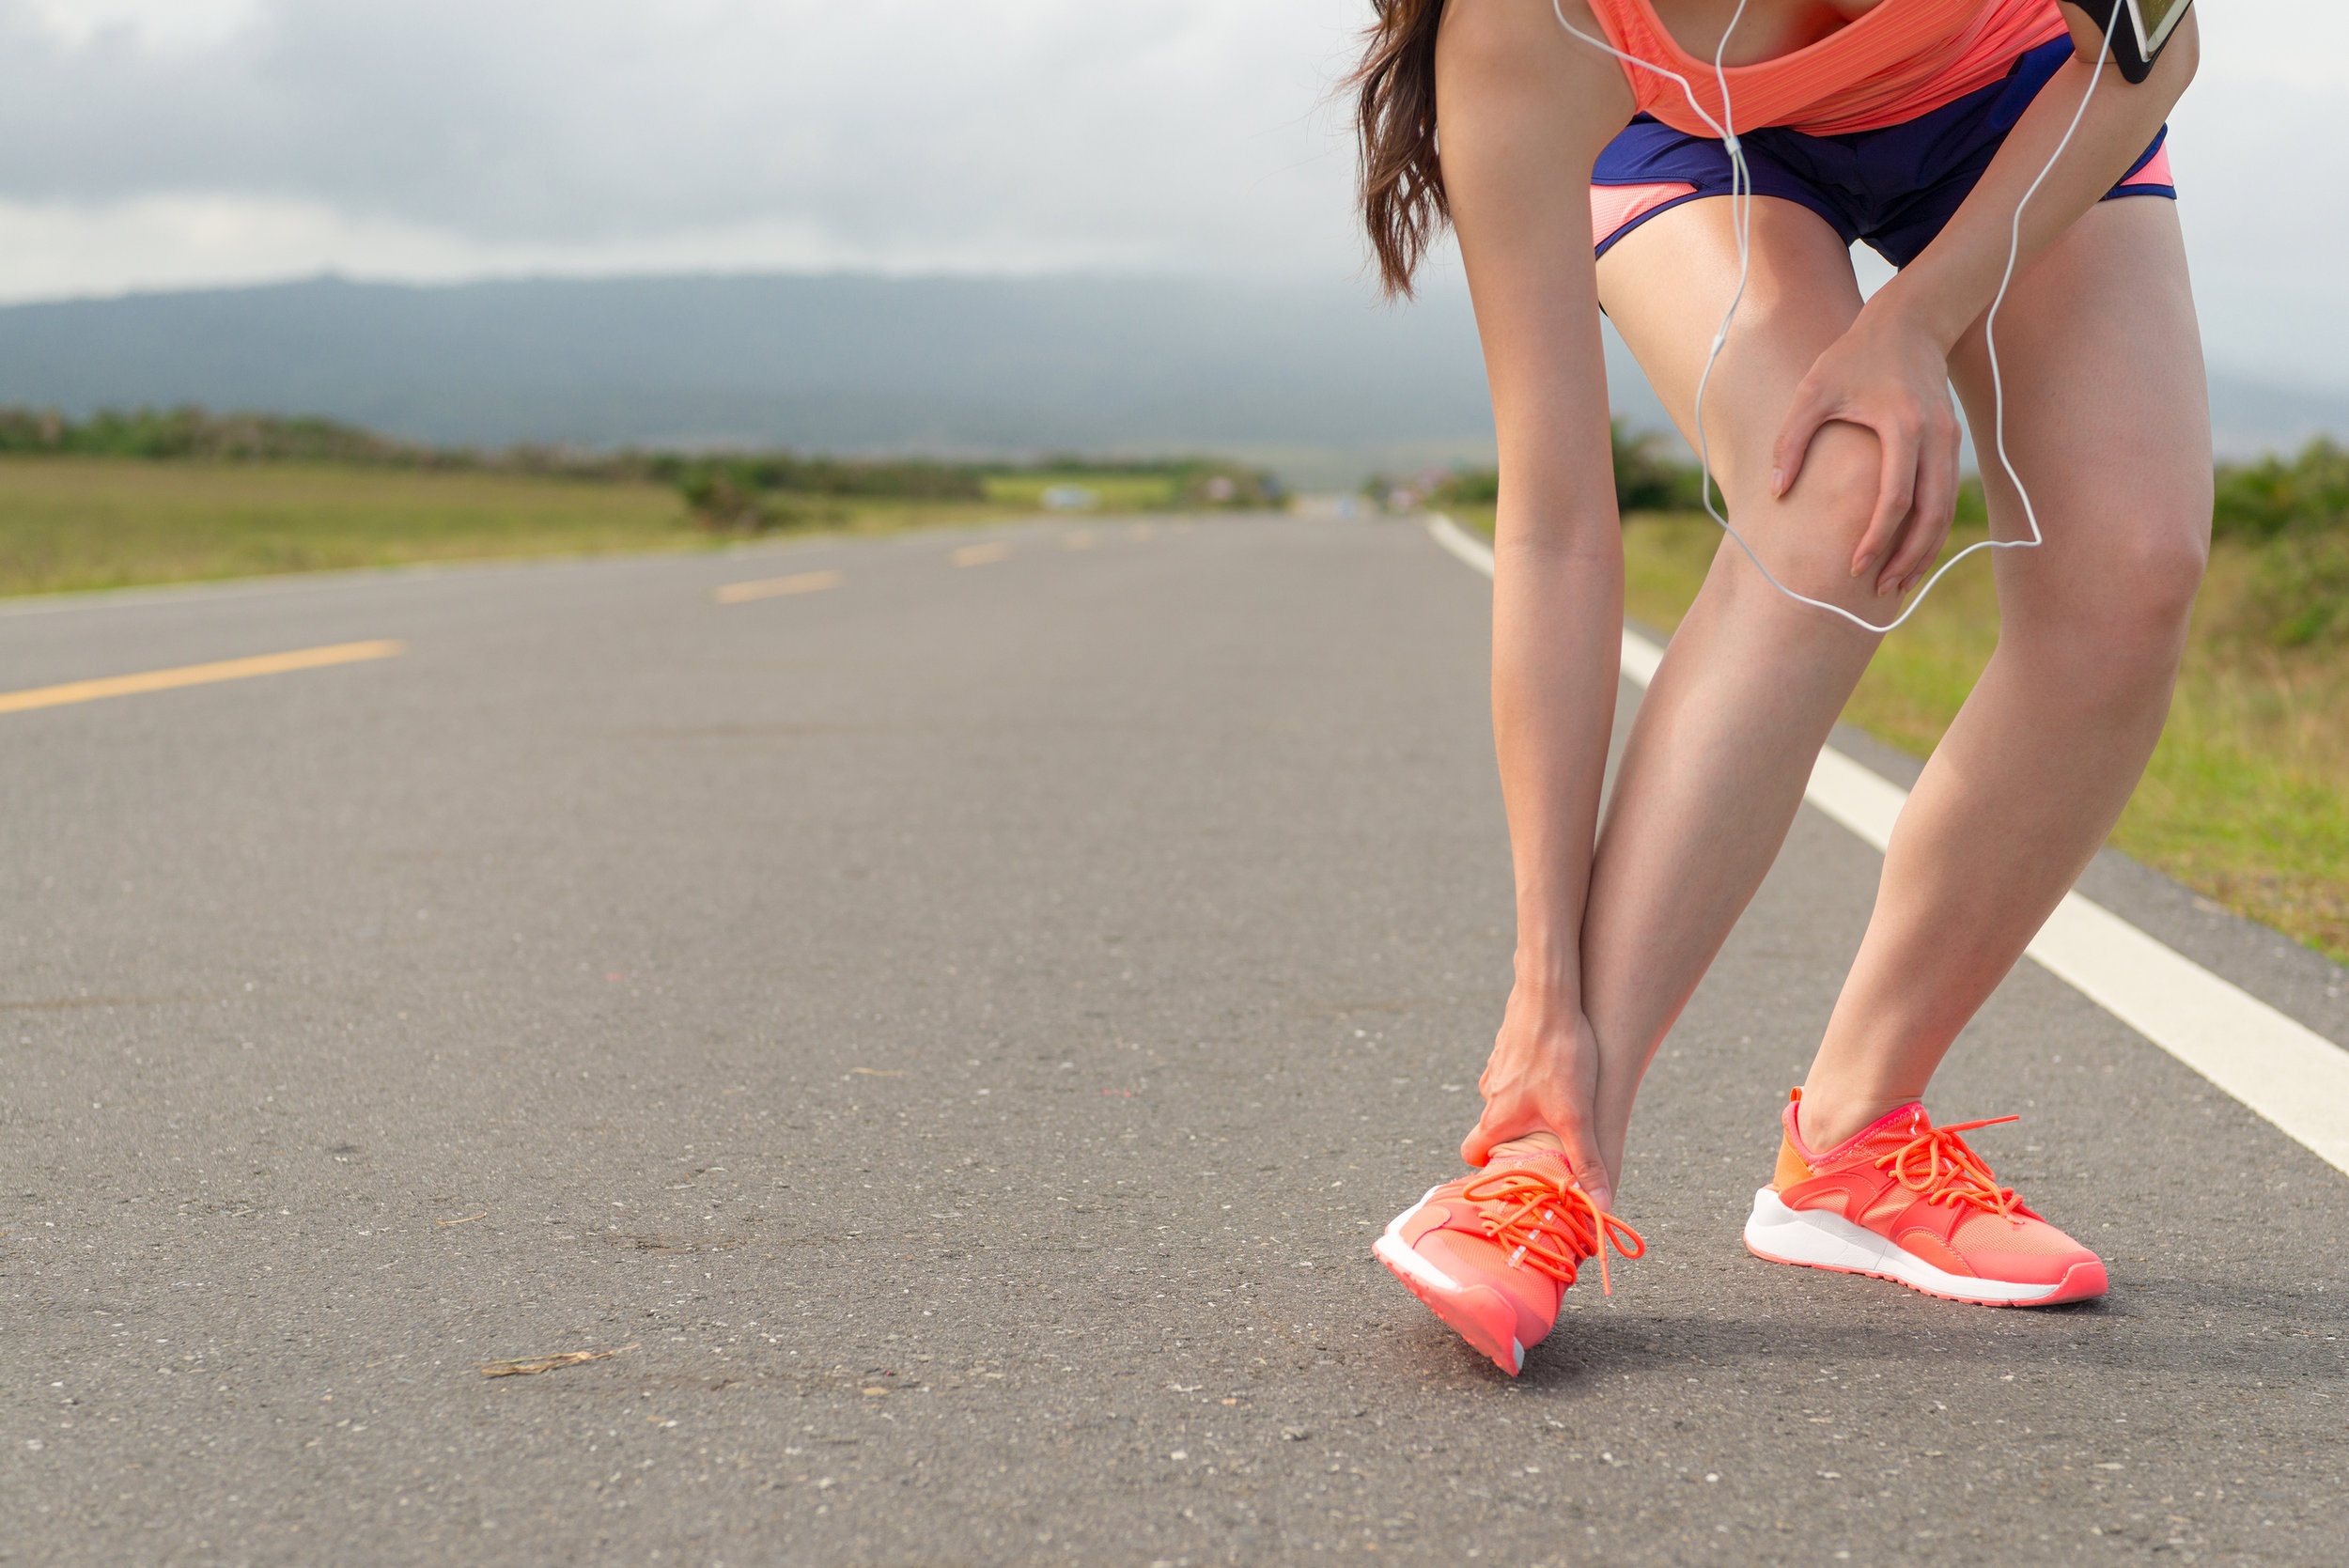 bigstock-Female-Athlete-Ankle-Injury-Wh-199041655.jpg